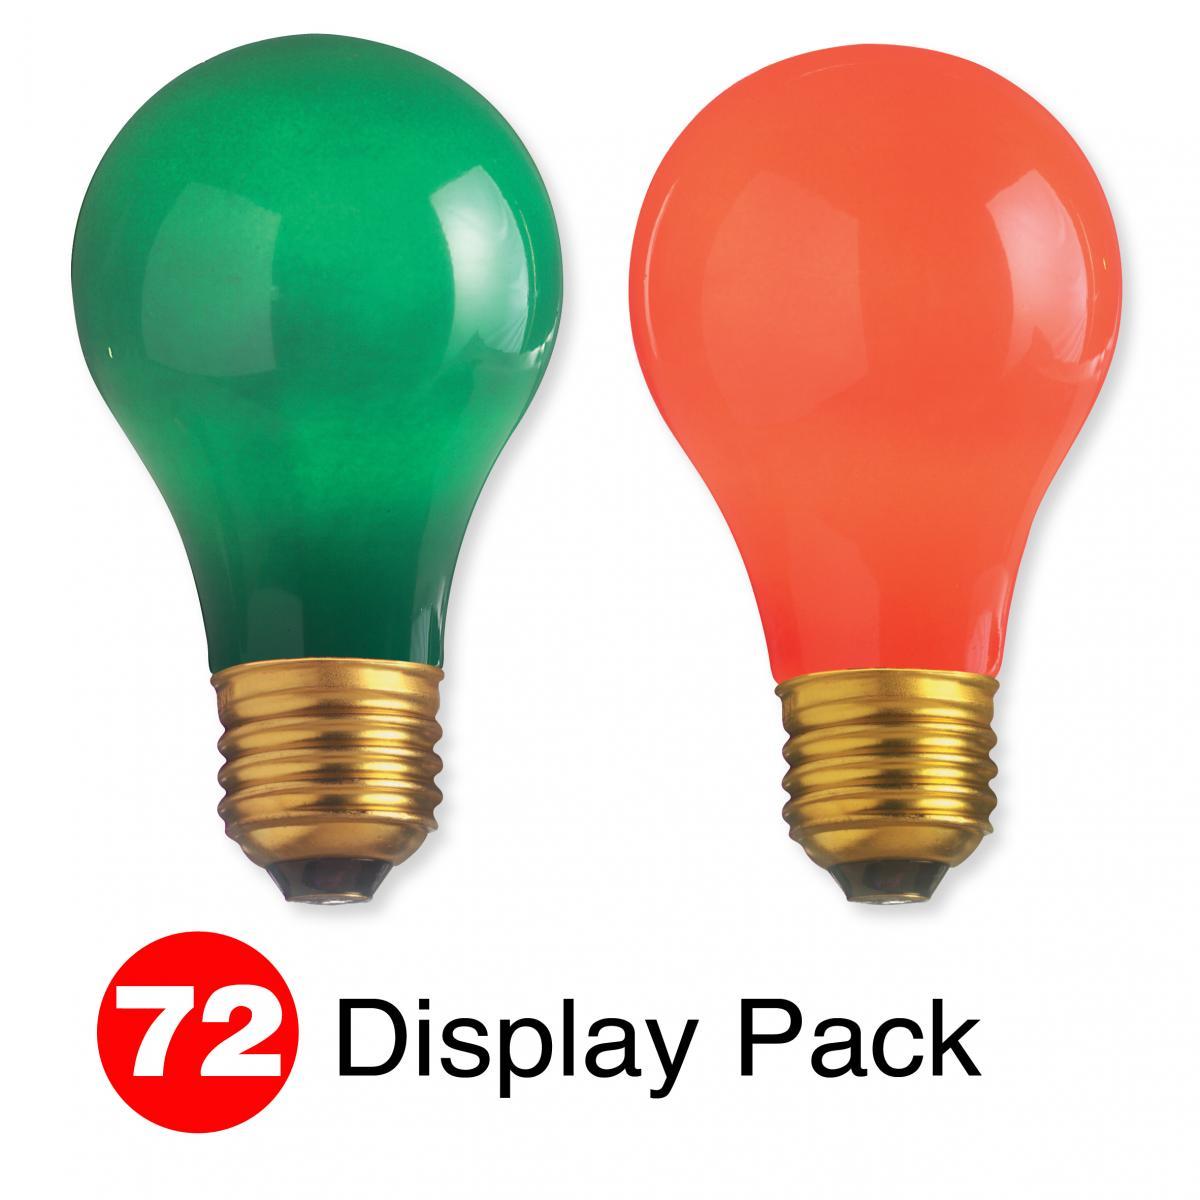 Ceramic Red Satco S6090 25 Watt A19 Incandescent Light Bulb